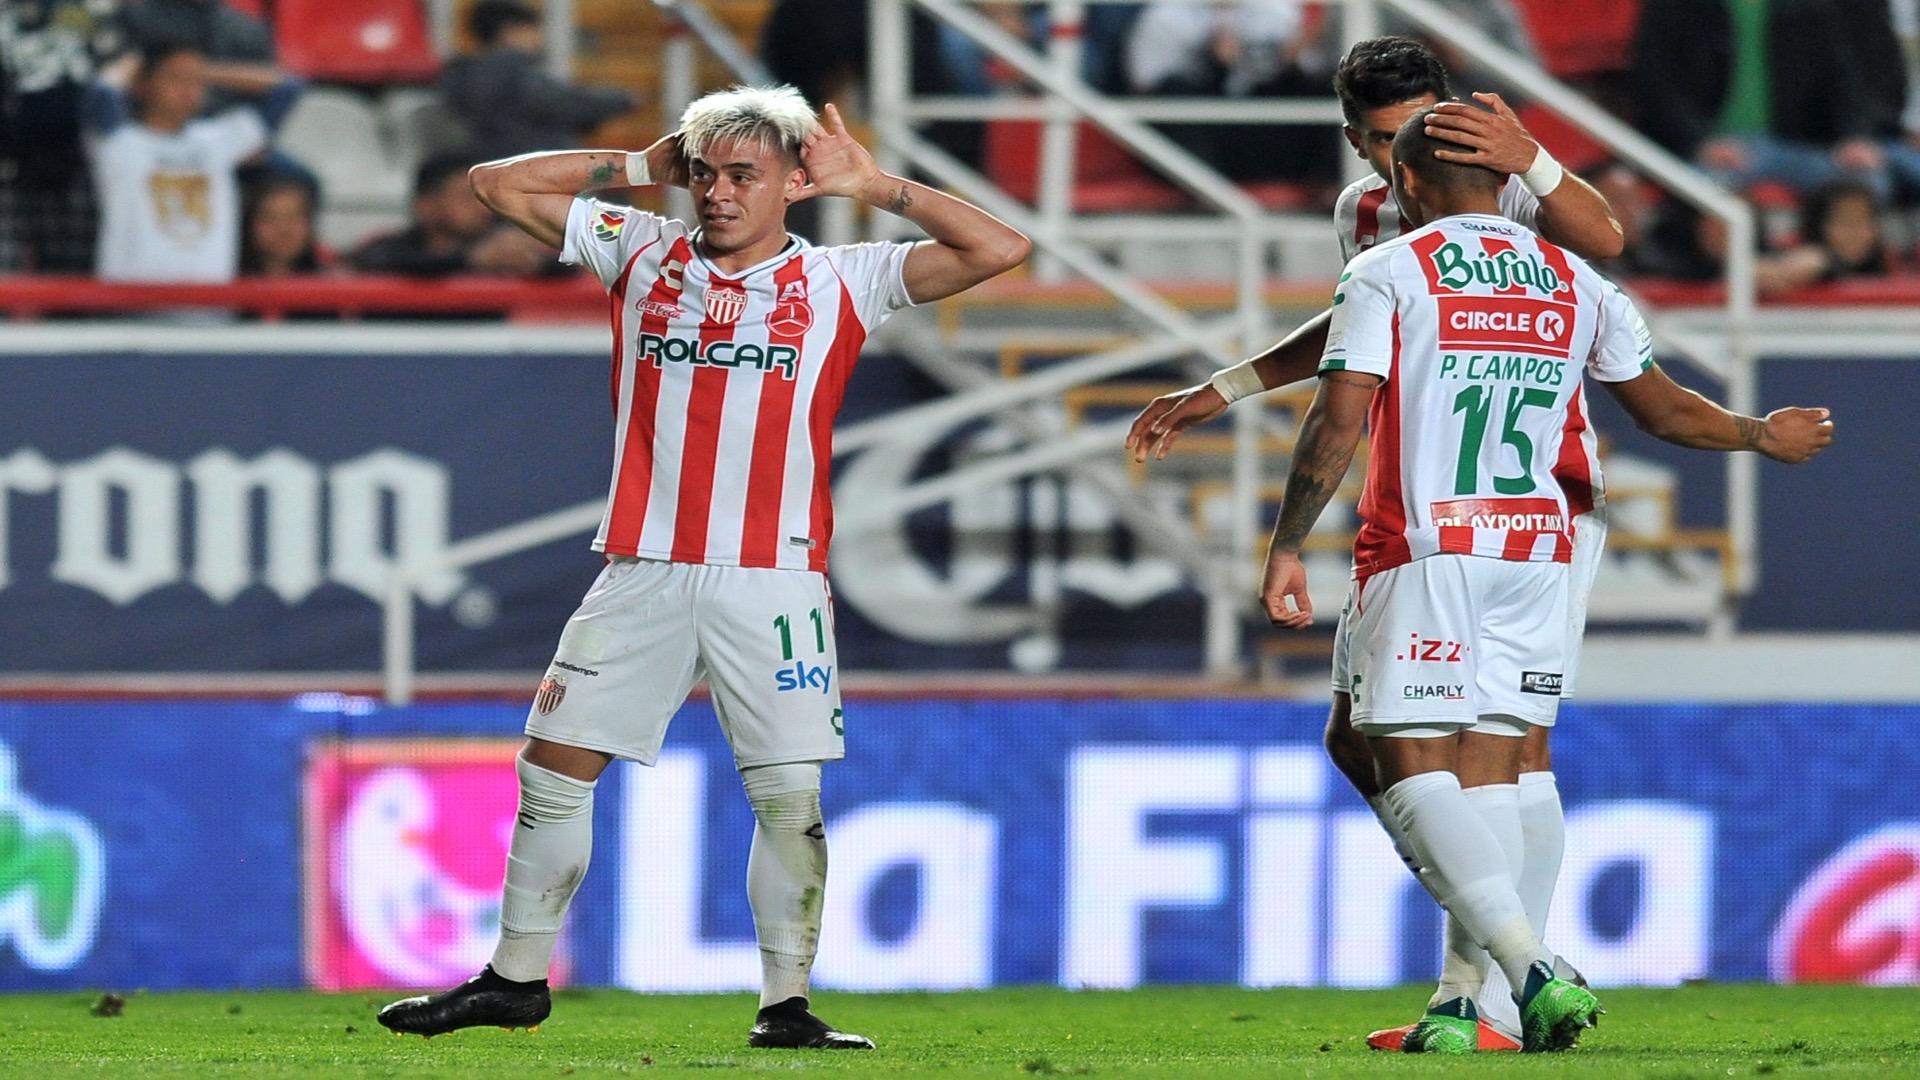 Brian Fernández Necaxa Clausura 2019